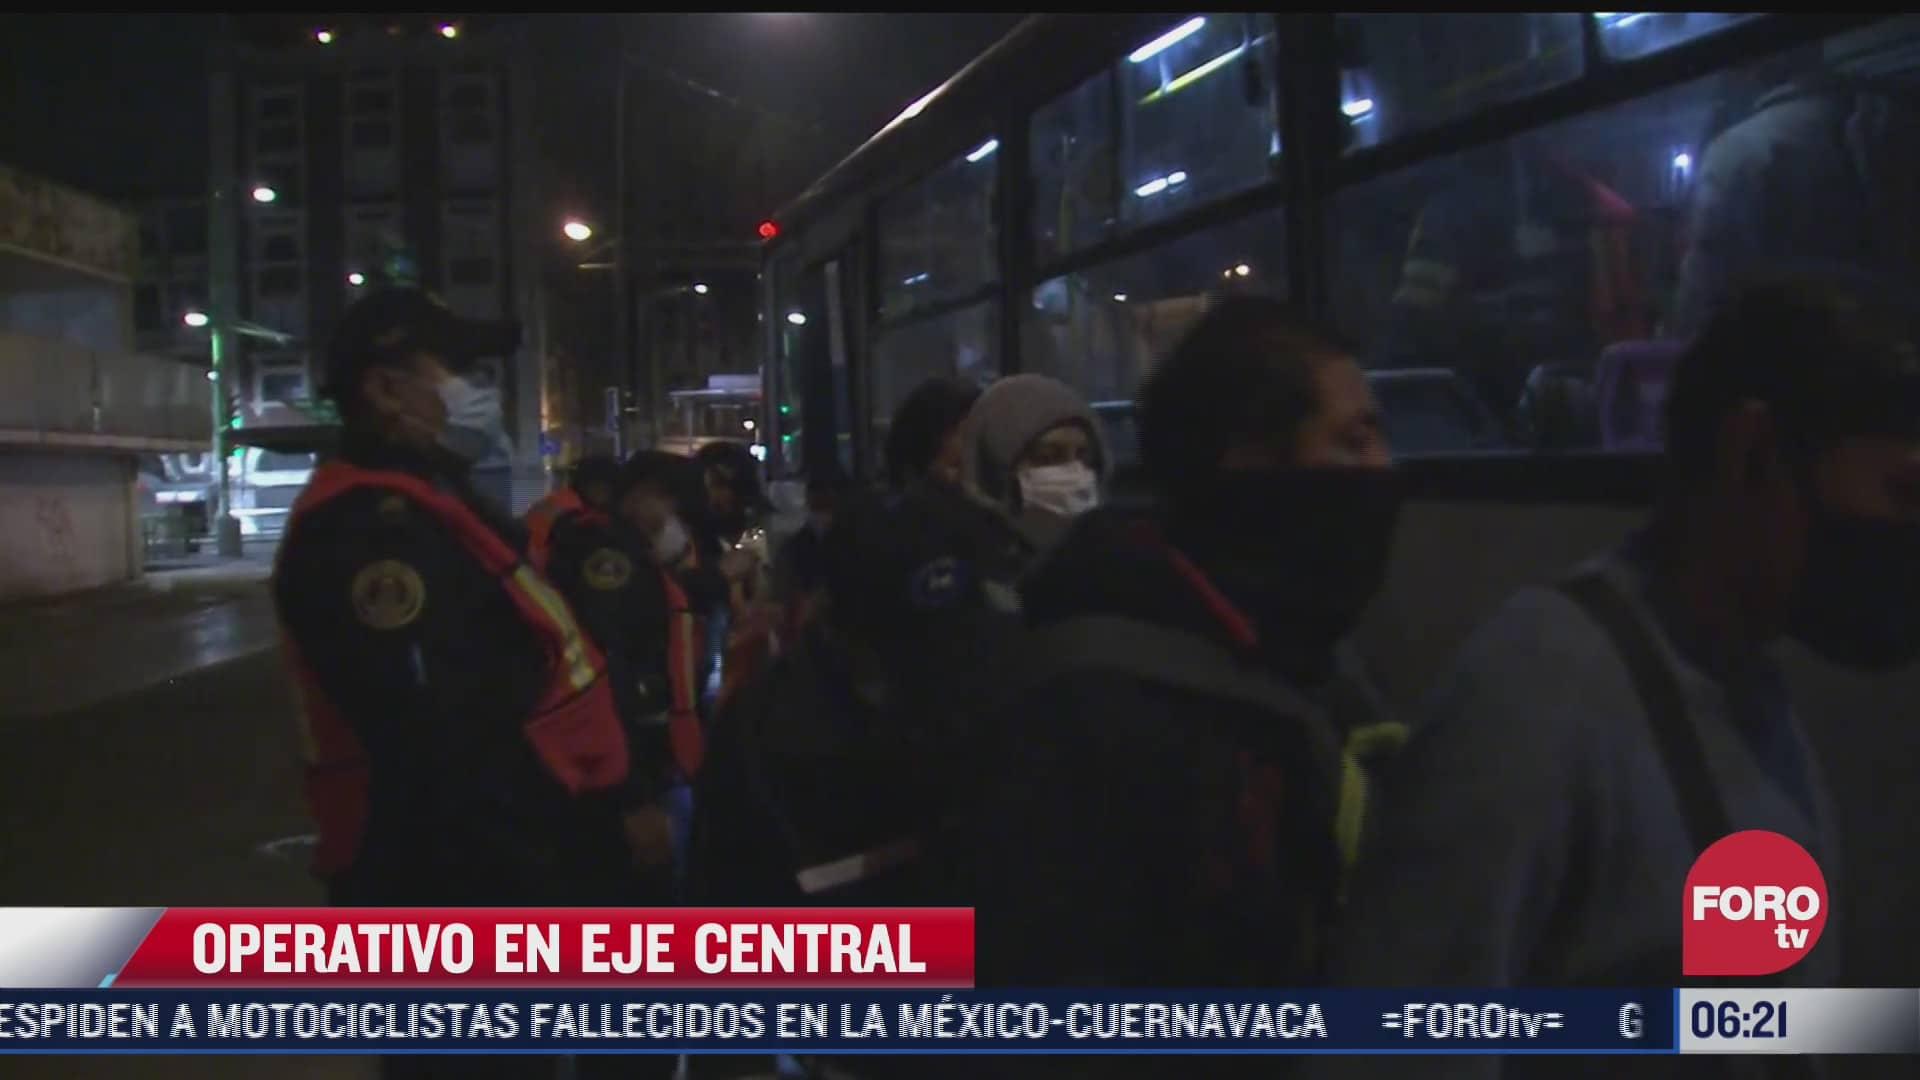 policias capitalinos realizan revisiones en transporte publico para prevenir asaltos